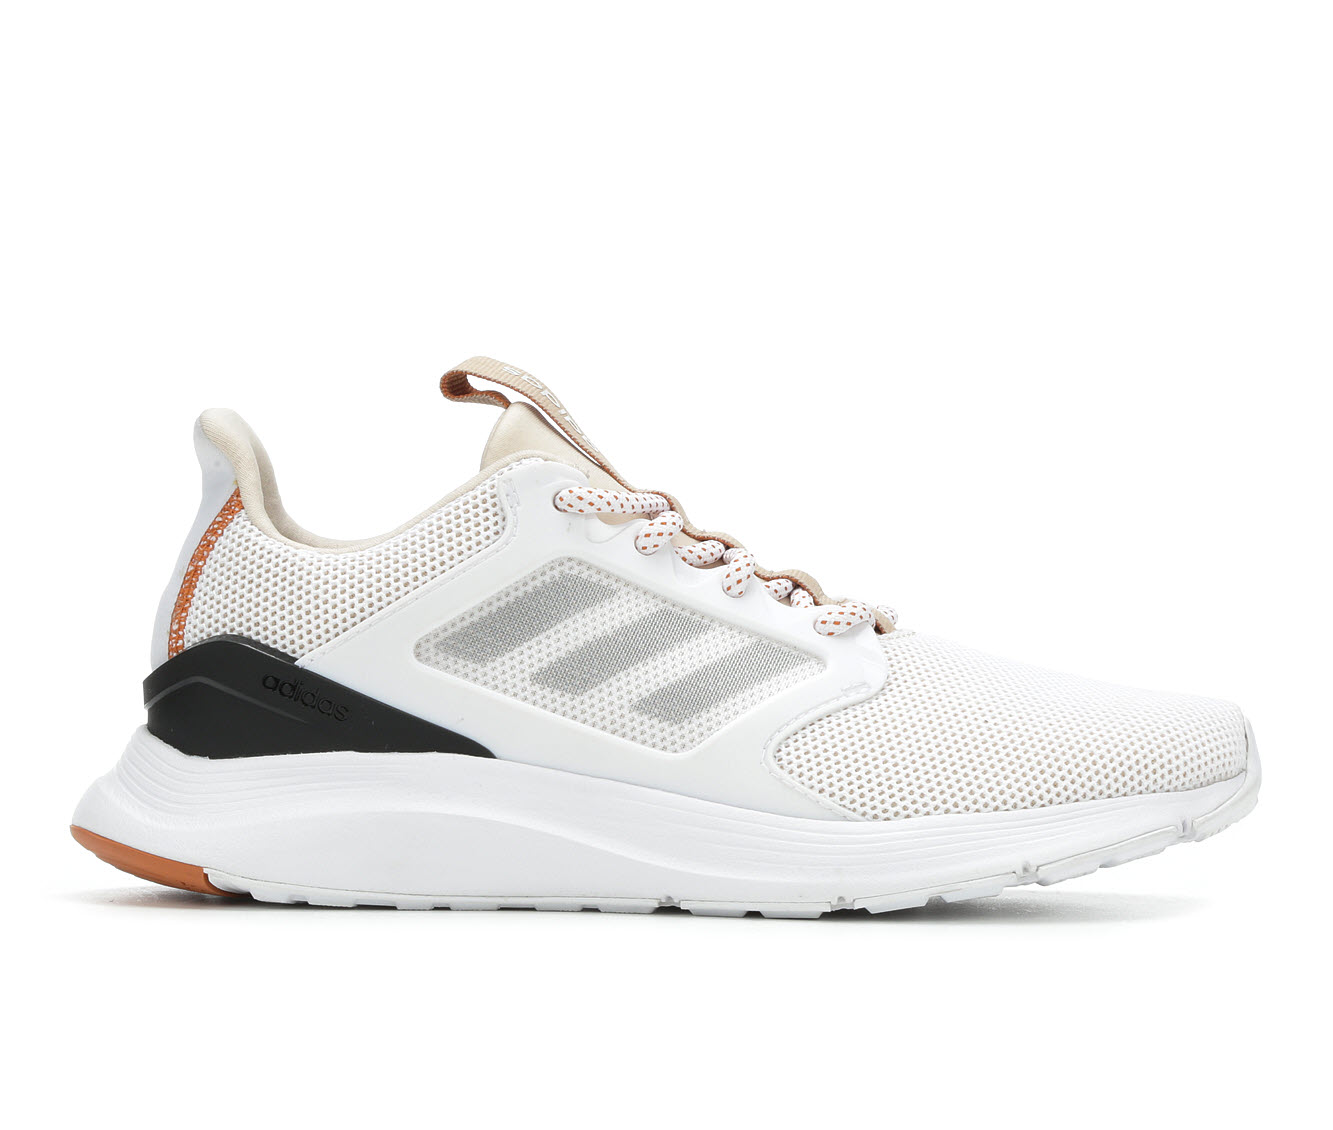 Adidas Energy Falcon X Women's Athletic Shoe (Beige)